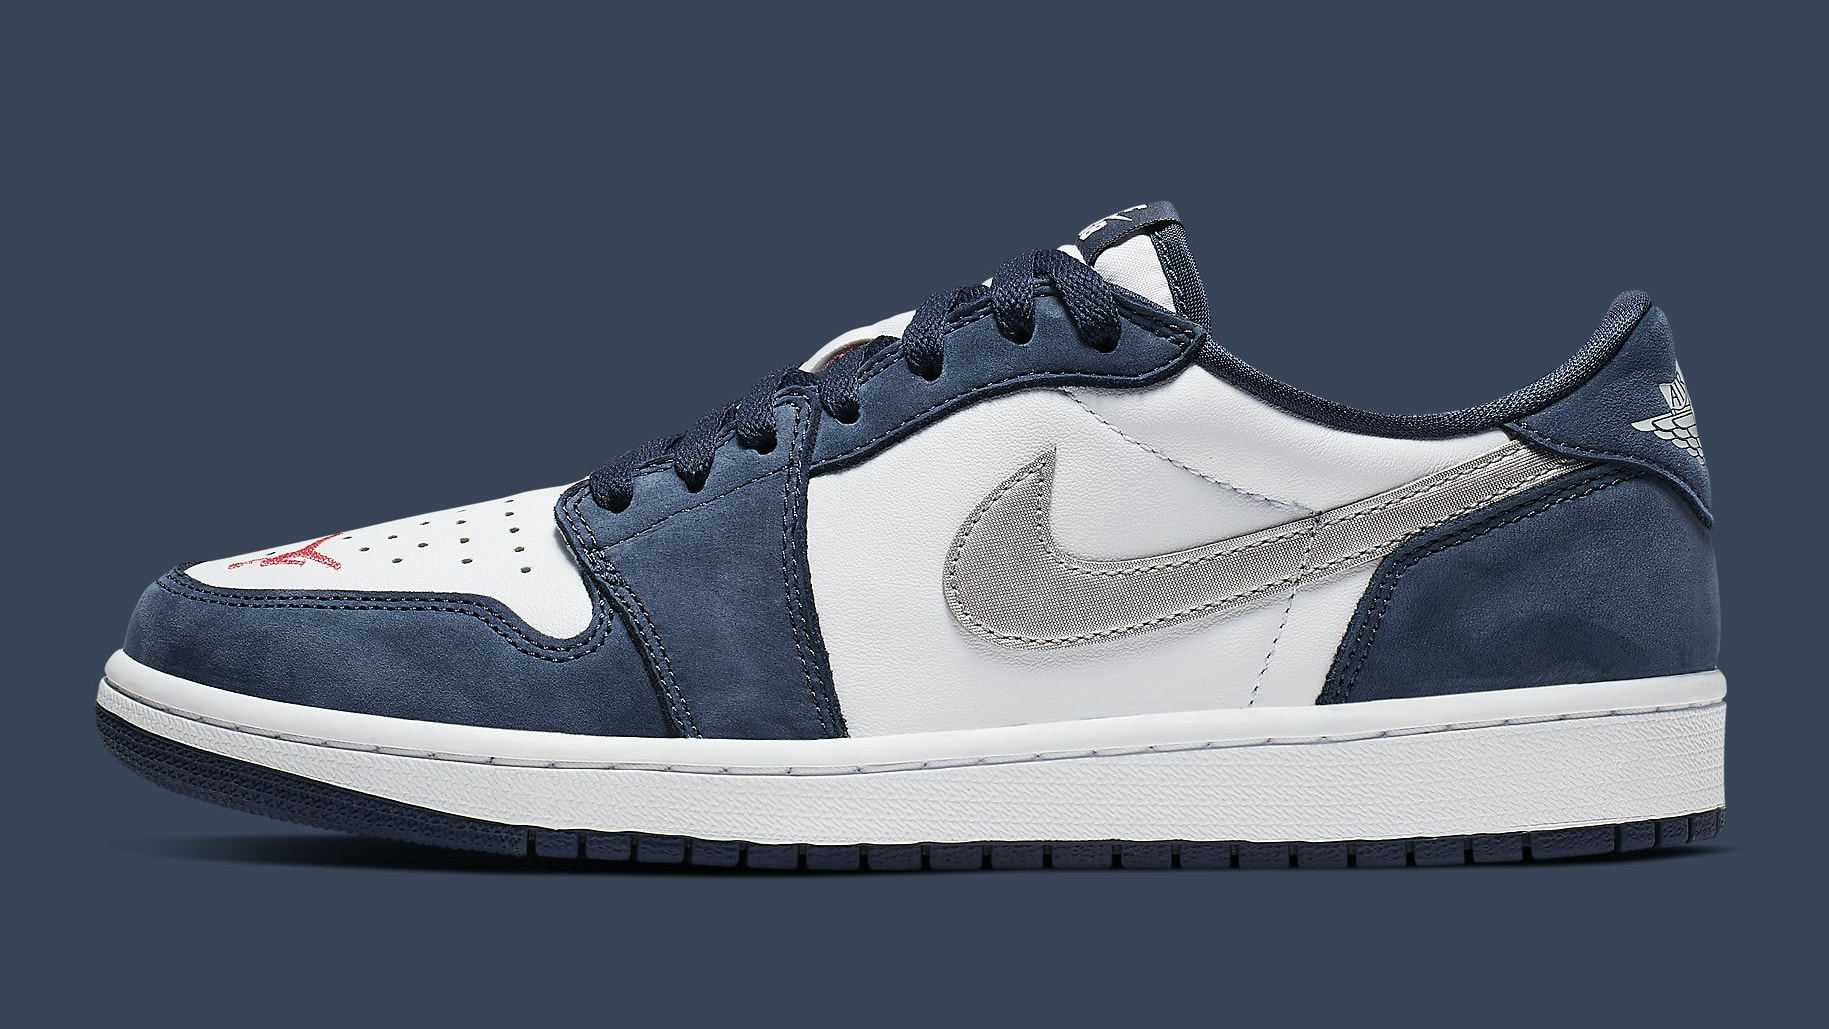 Nike SB Air Jordan 1 Low Koston Release Date CJ7891-400 Profile